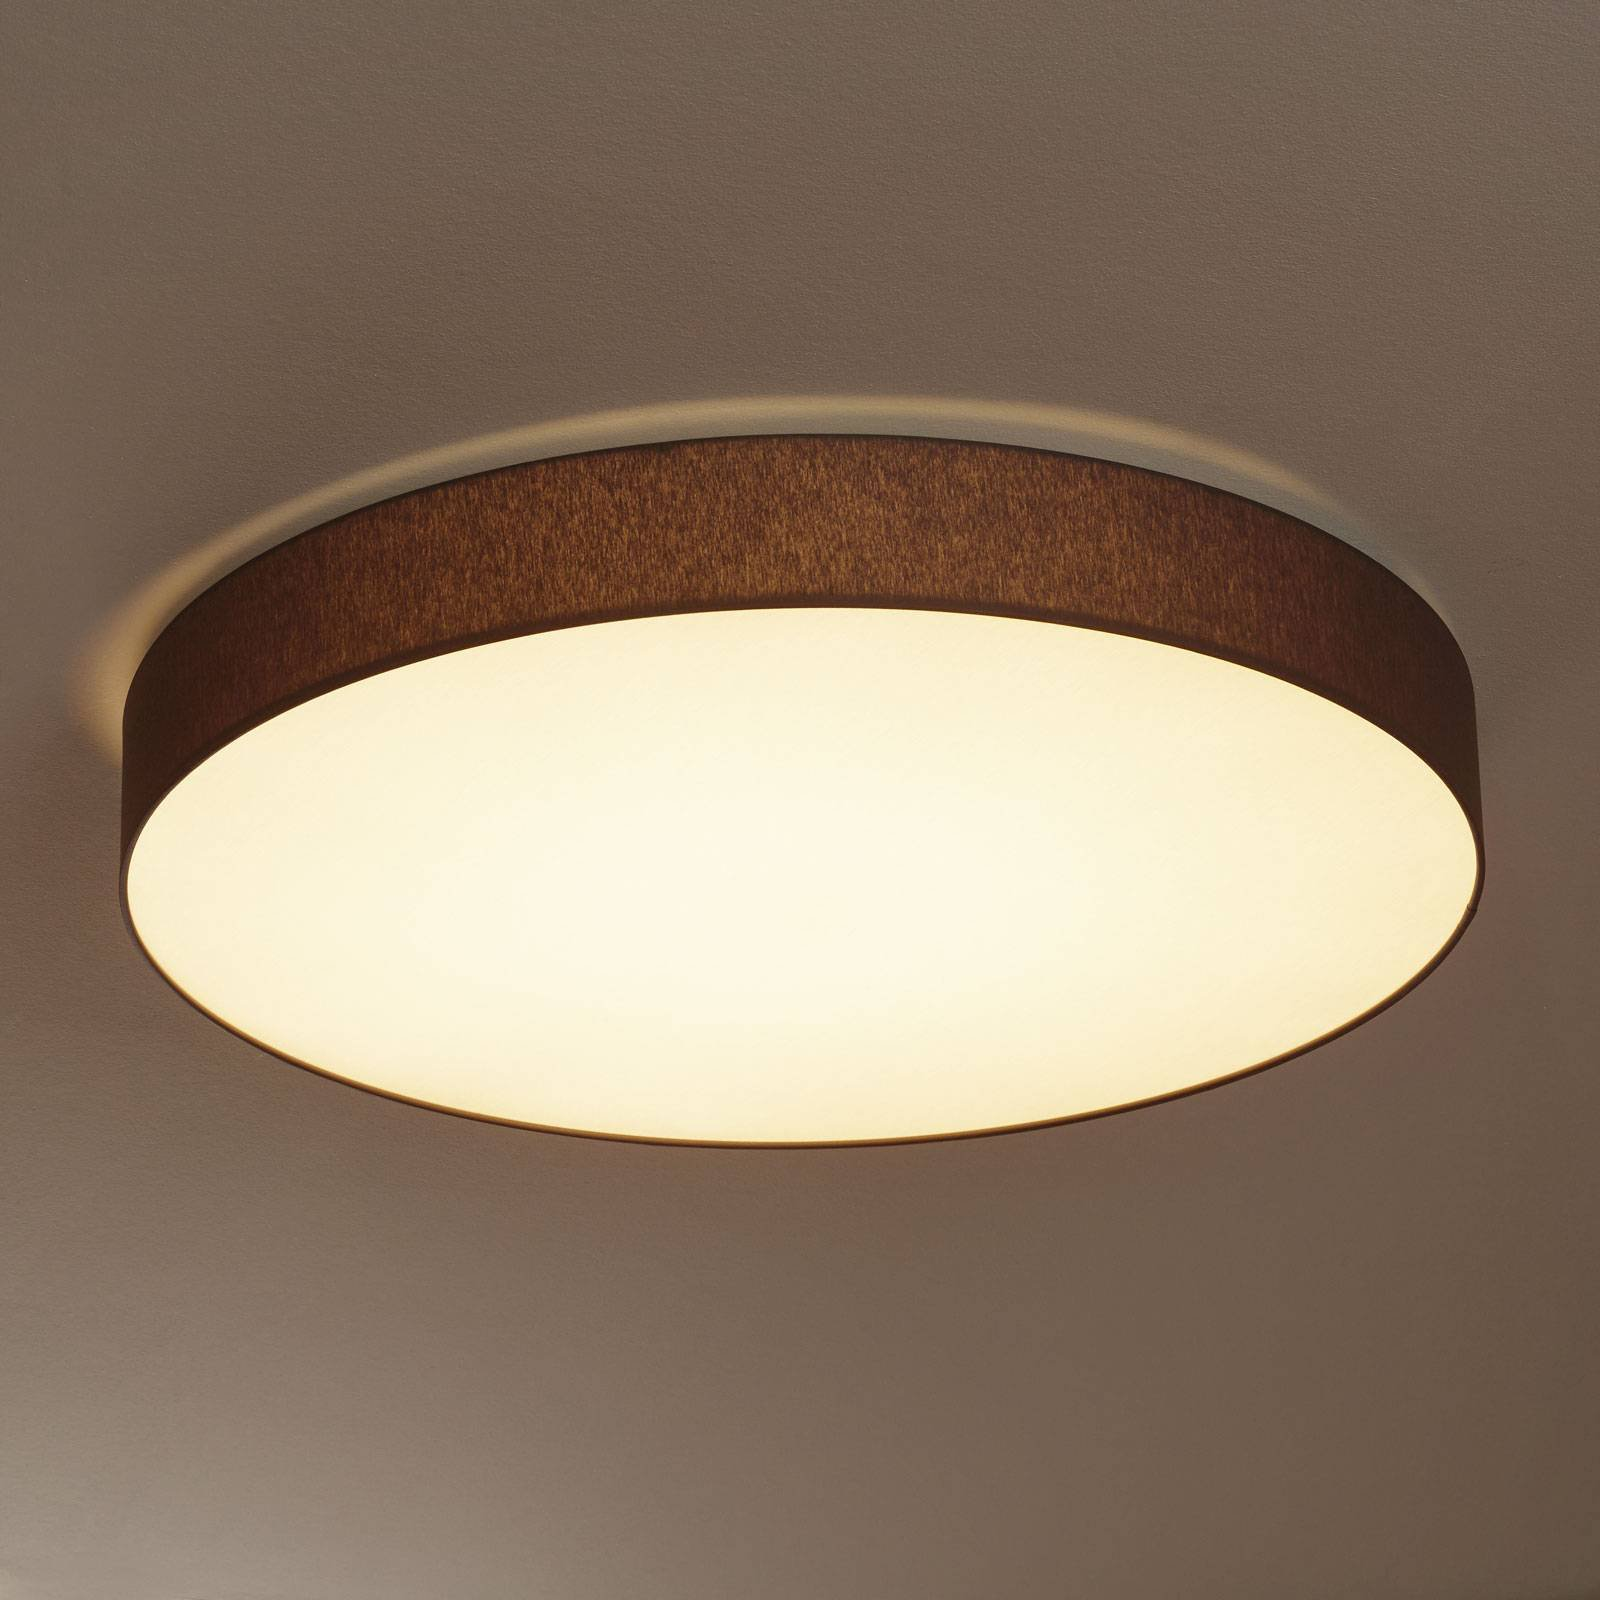 LED-taklampe Luno med chintzskjerm